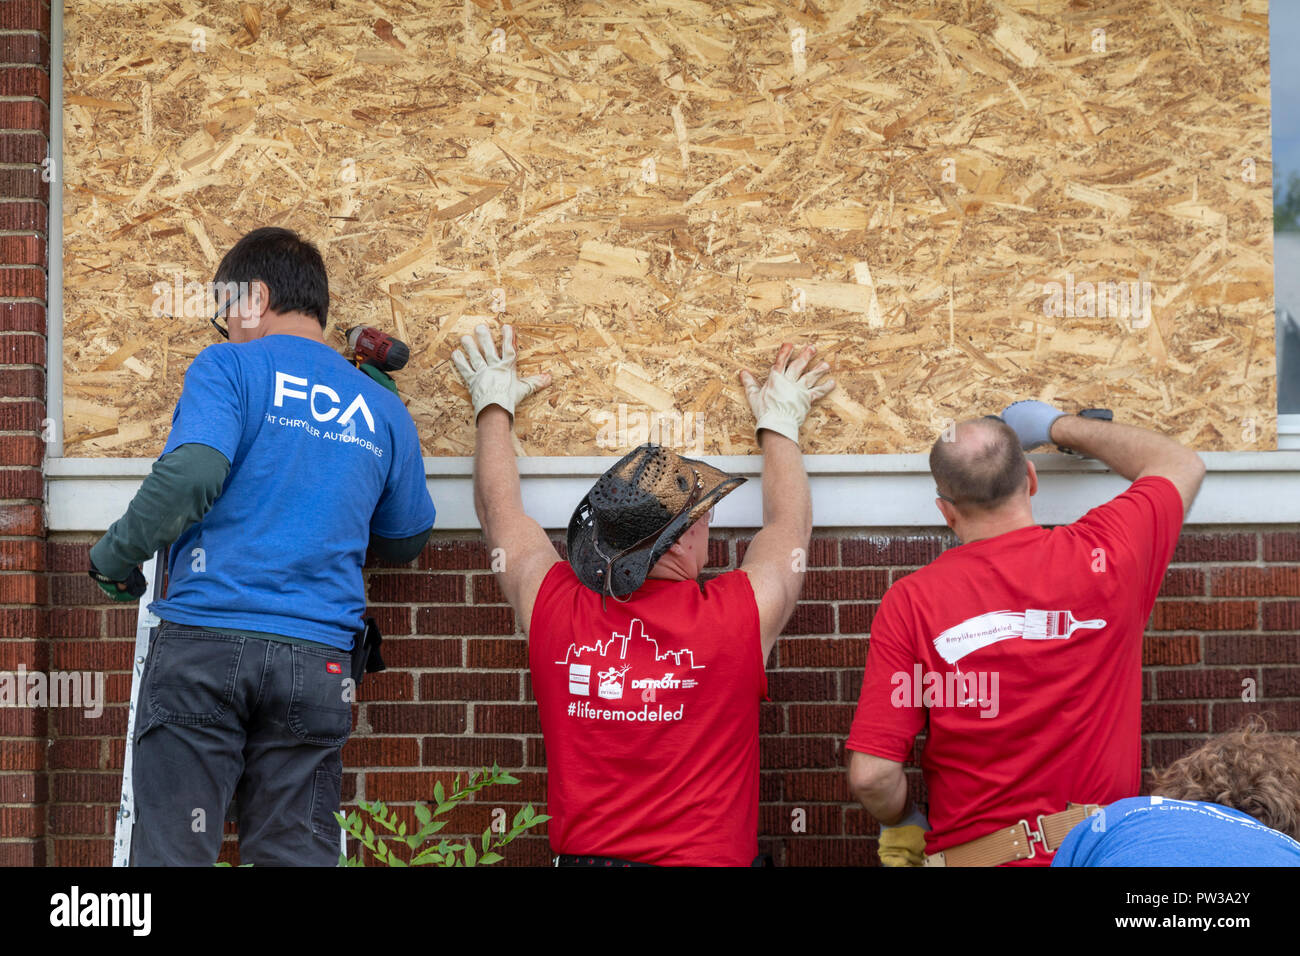 Detroit, Michigan - Volunteers clean up a distressed neighborhood during a week-long community improvement initiative called Life ReModeled. Volunteer Stock Photo